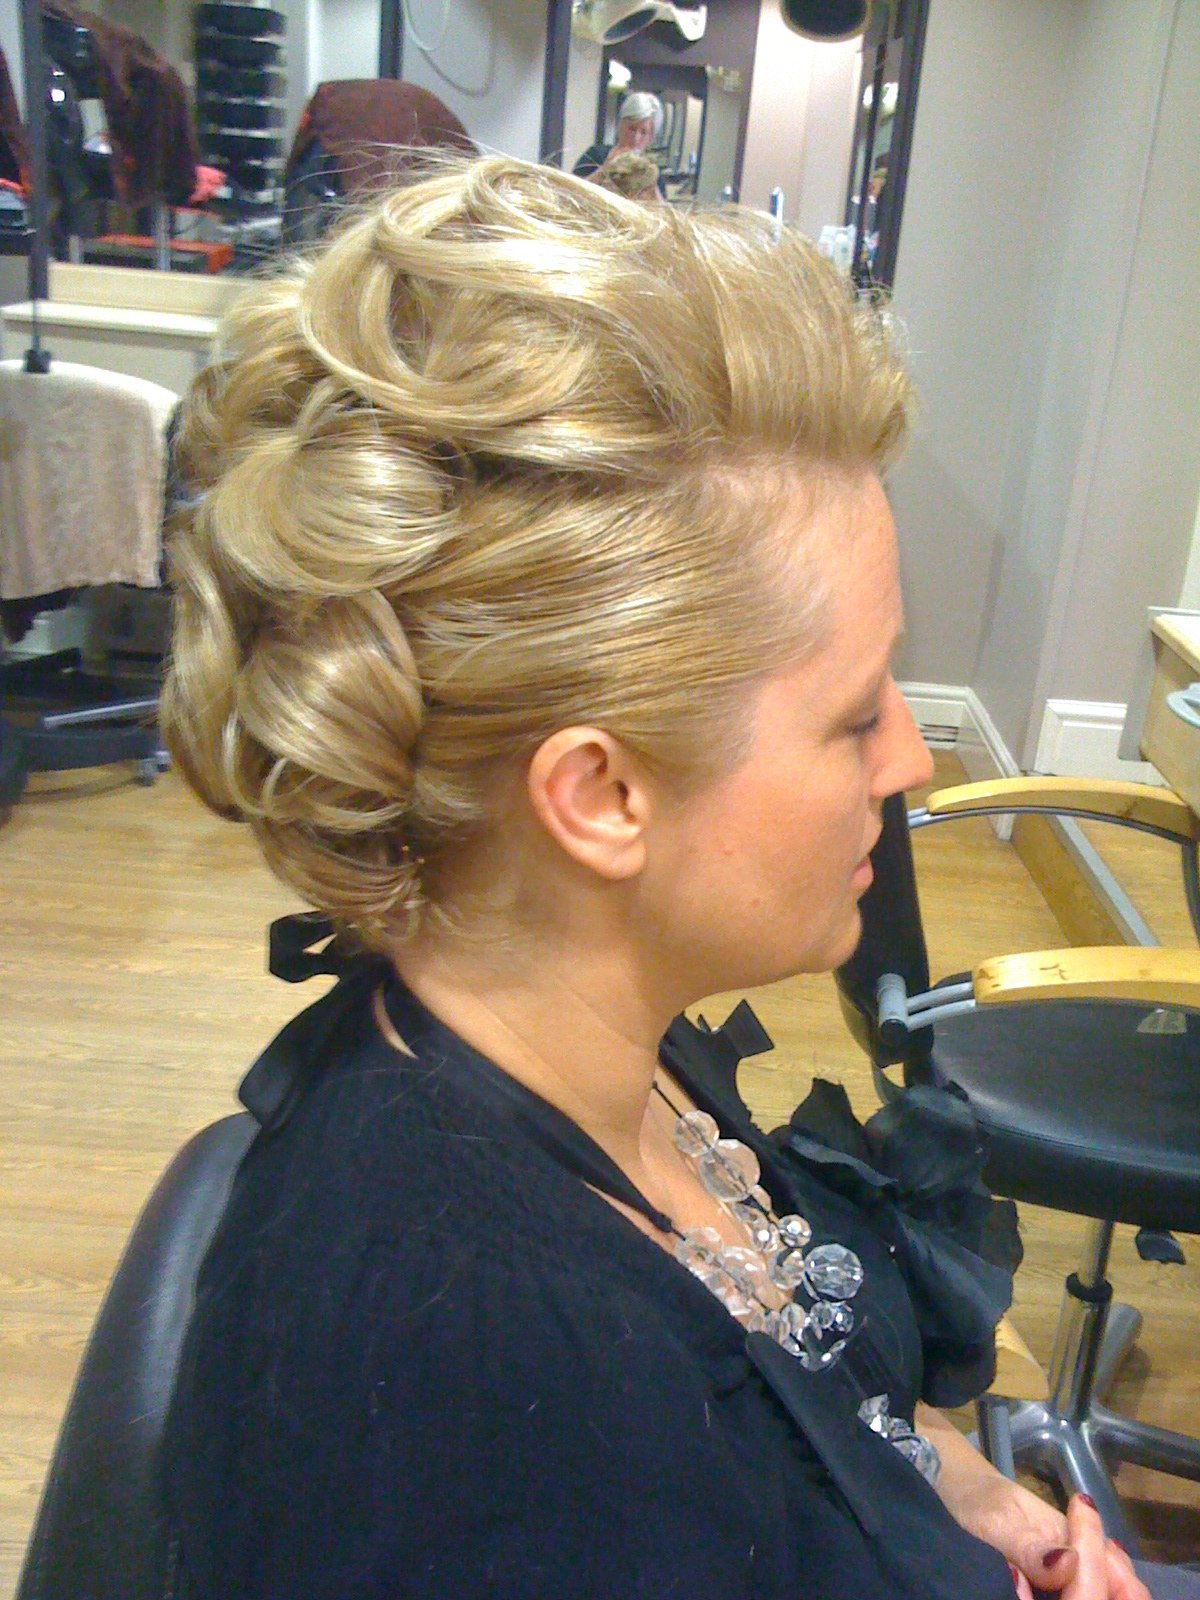 beautifully styled women's hair